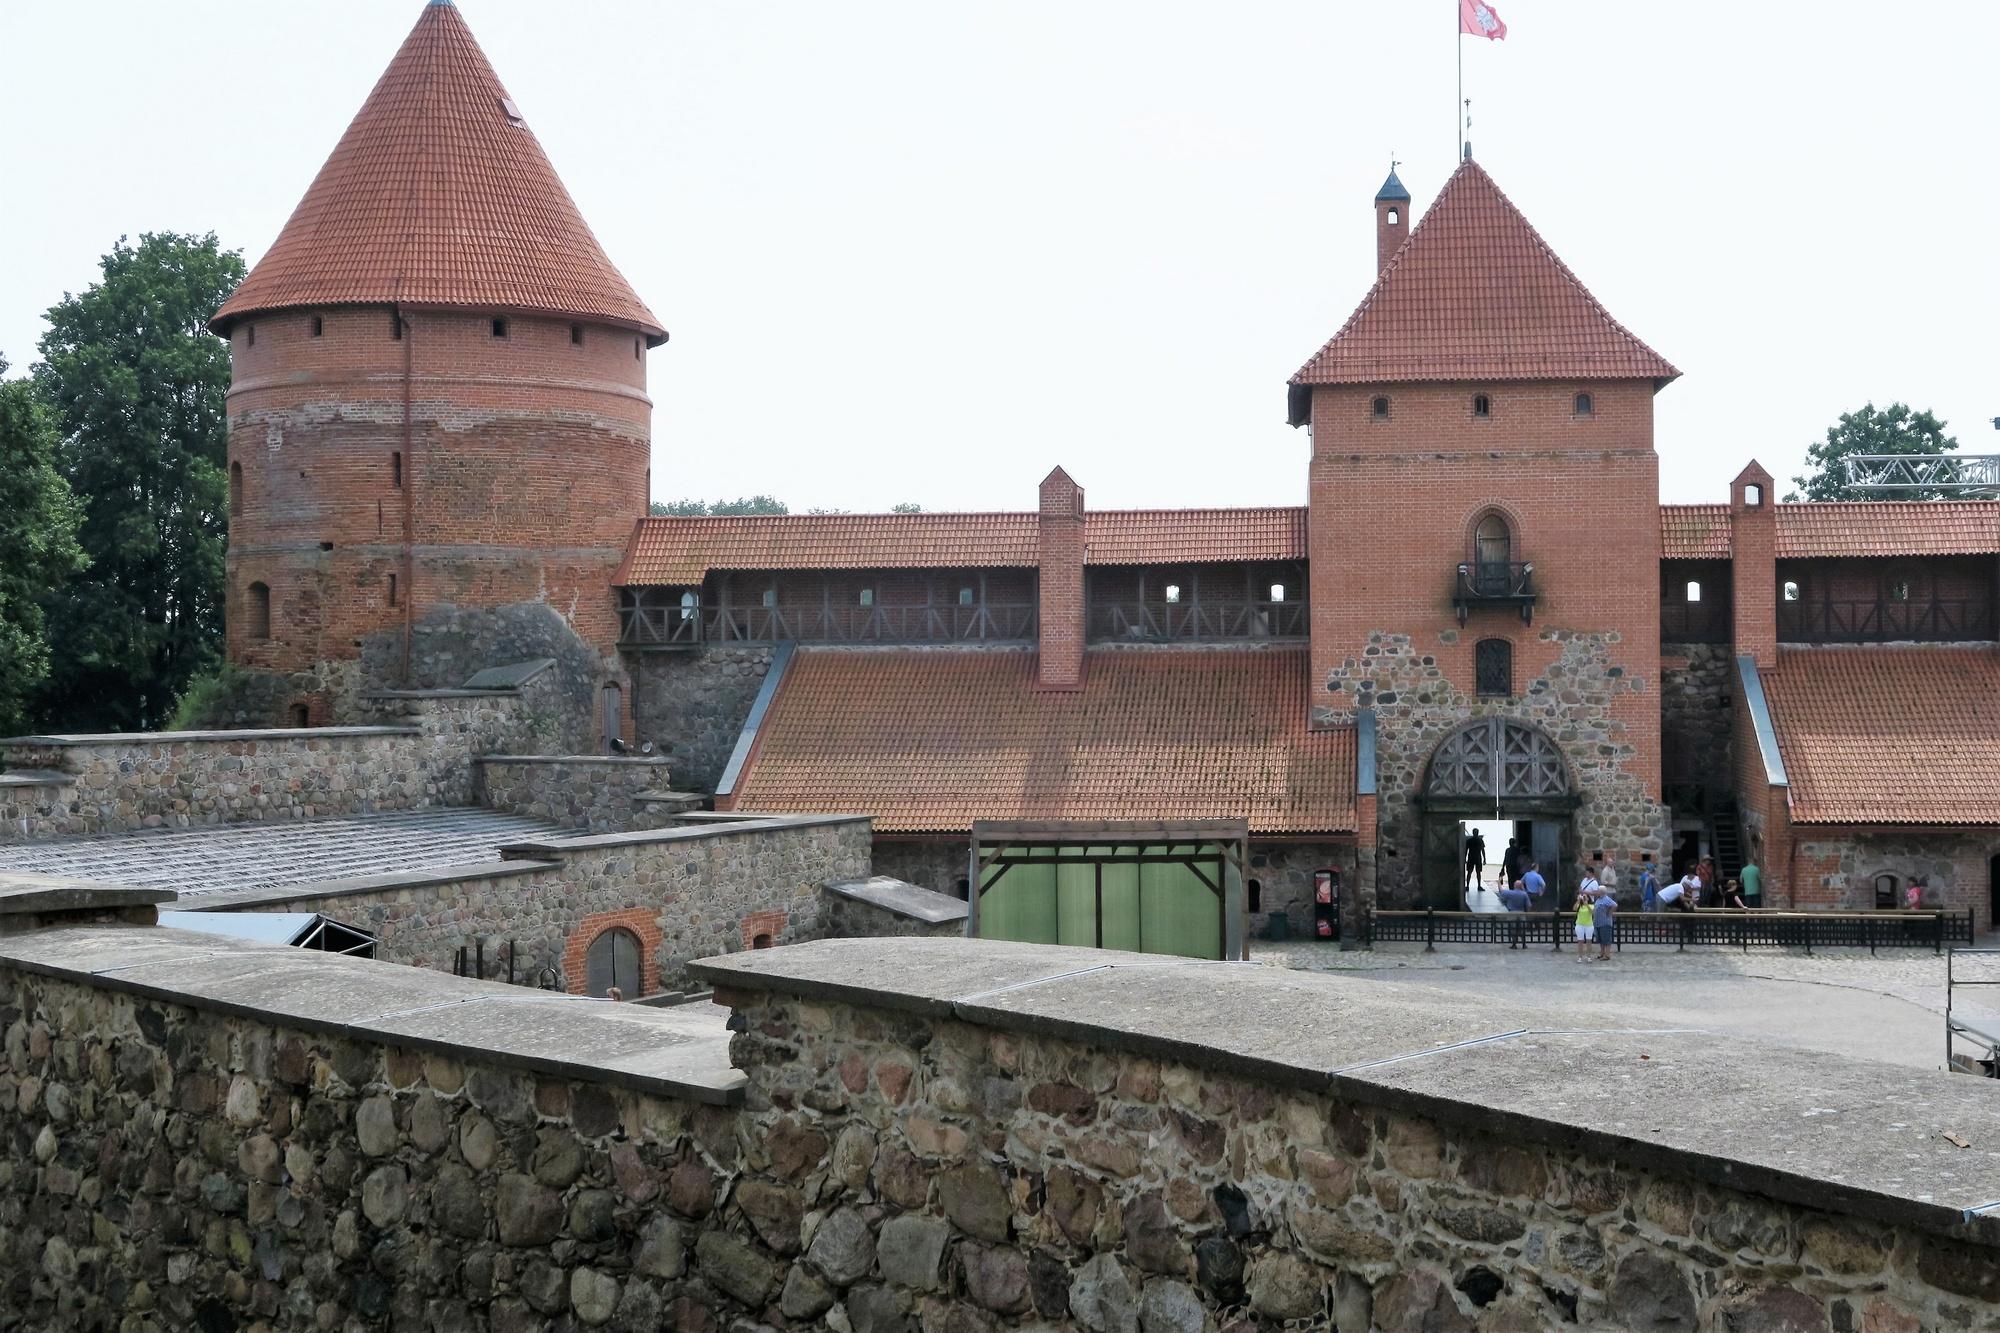 Le château de TRAKAÏ (Lituanie)